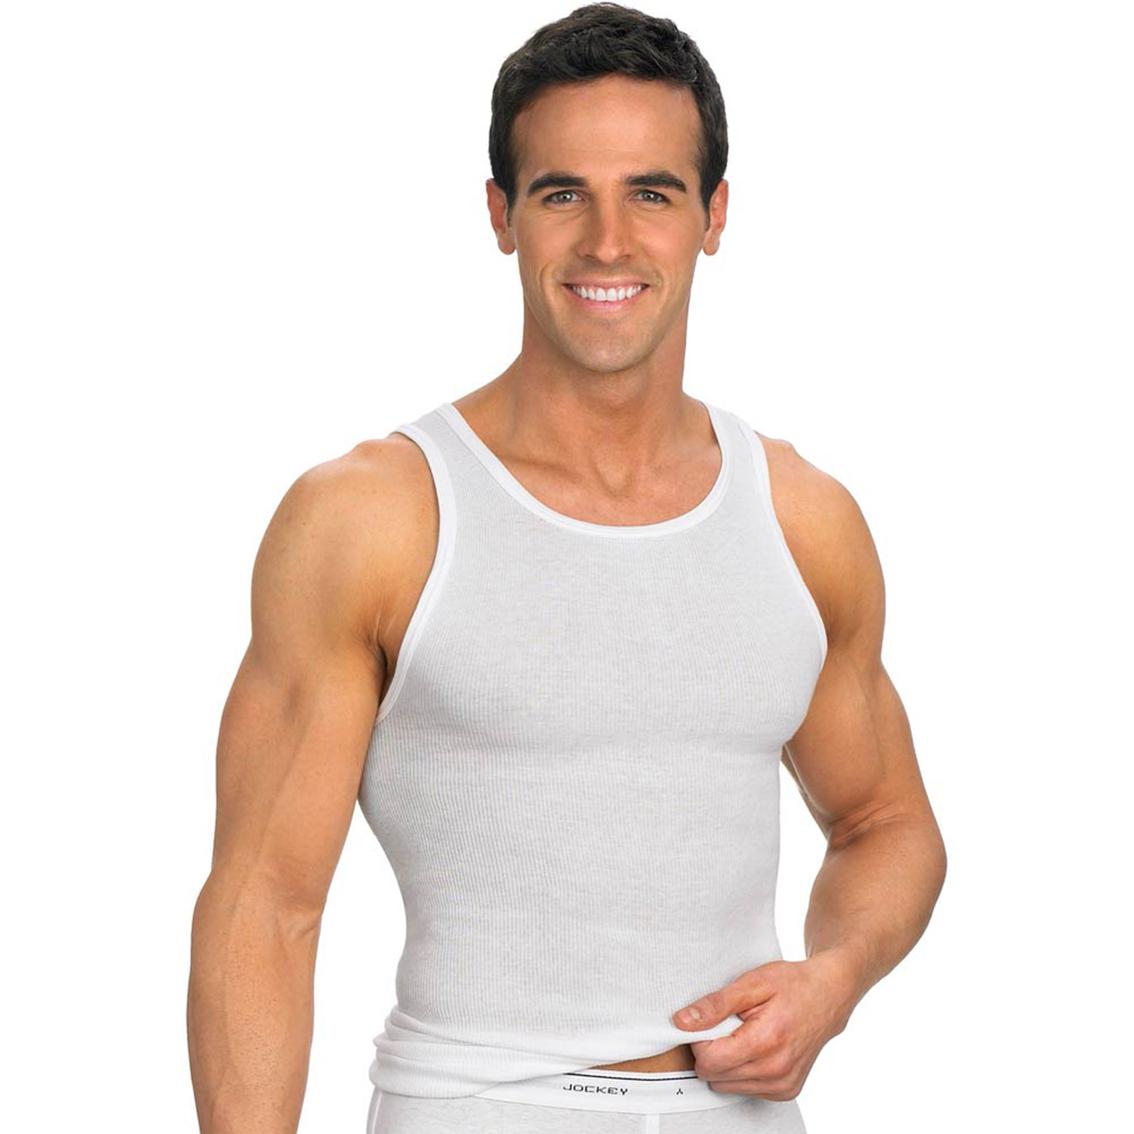 Jockey Classic A Shirt 3 Pk Undershirts Gifts Food